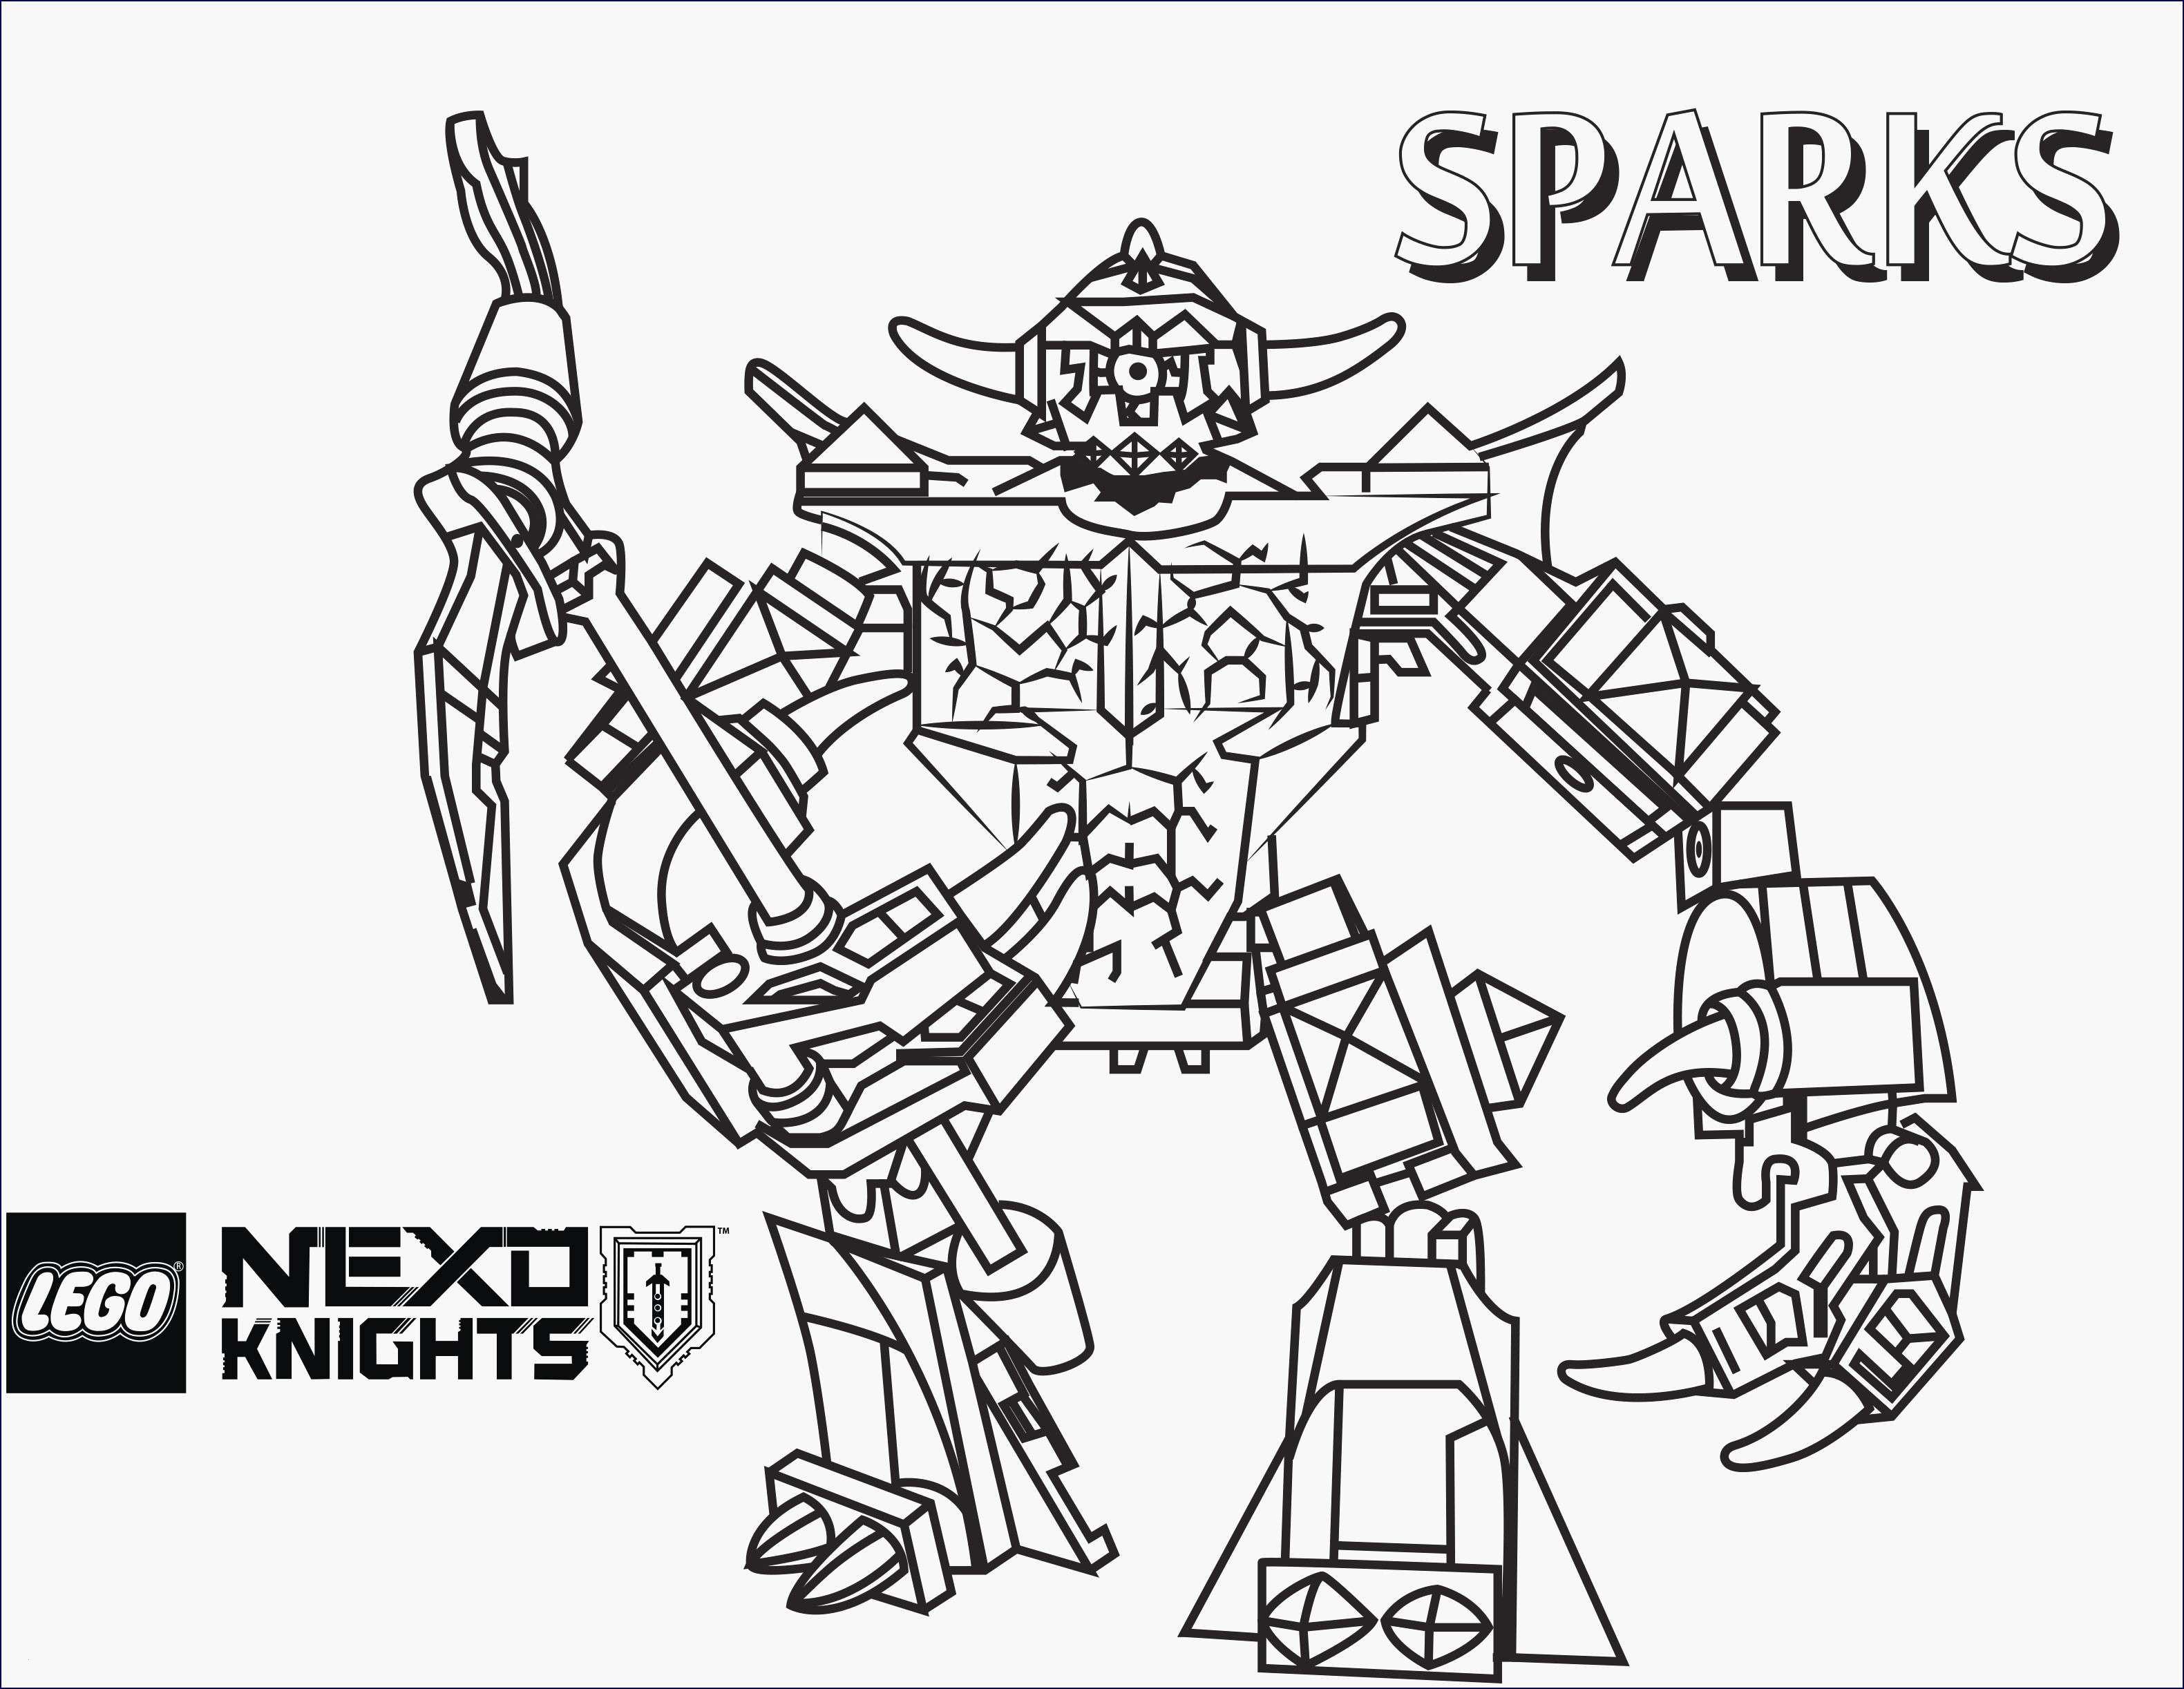 Ninjago Ausmalbilder Lord Garmadon Das Beste Von Lord Garmadon Ausmalbilder Schön Lego Ausmalbilder Nexo Knights Fotos